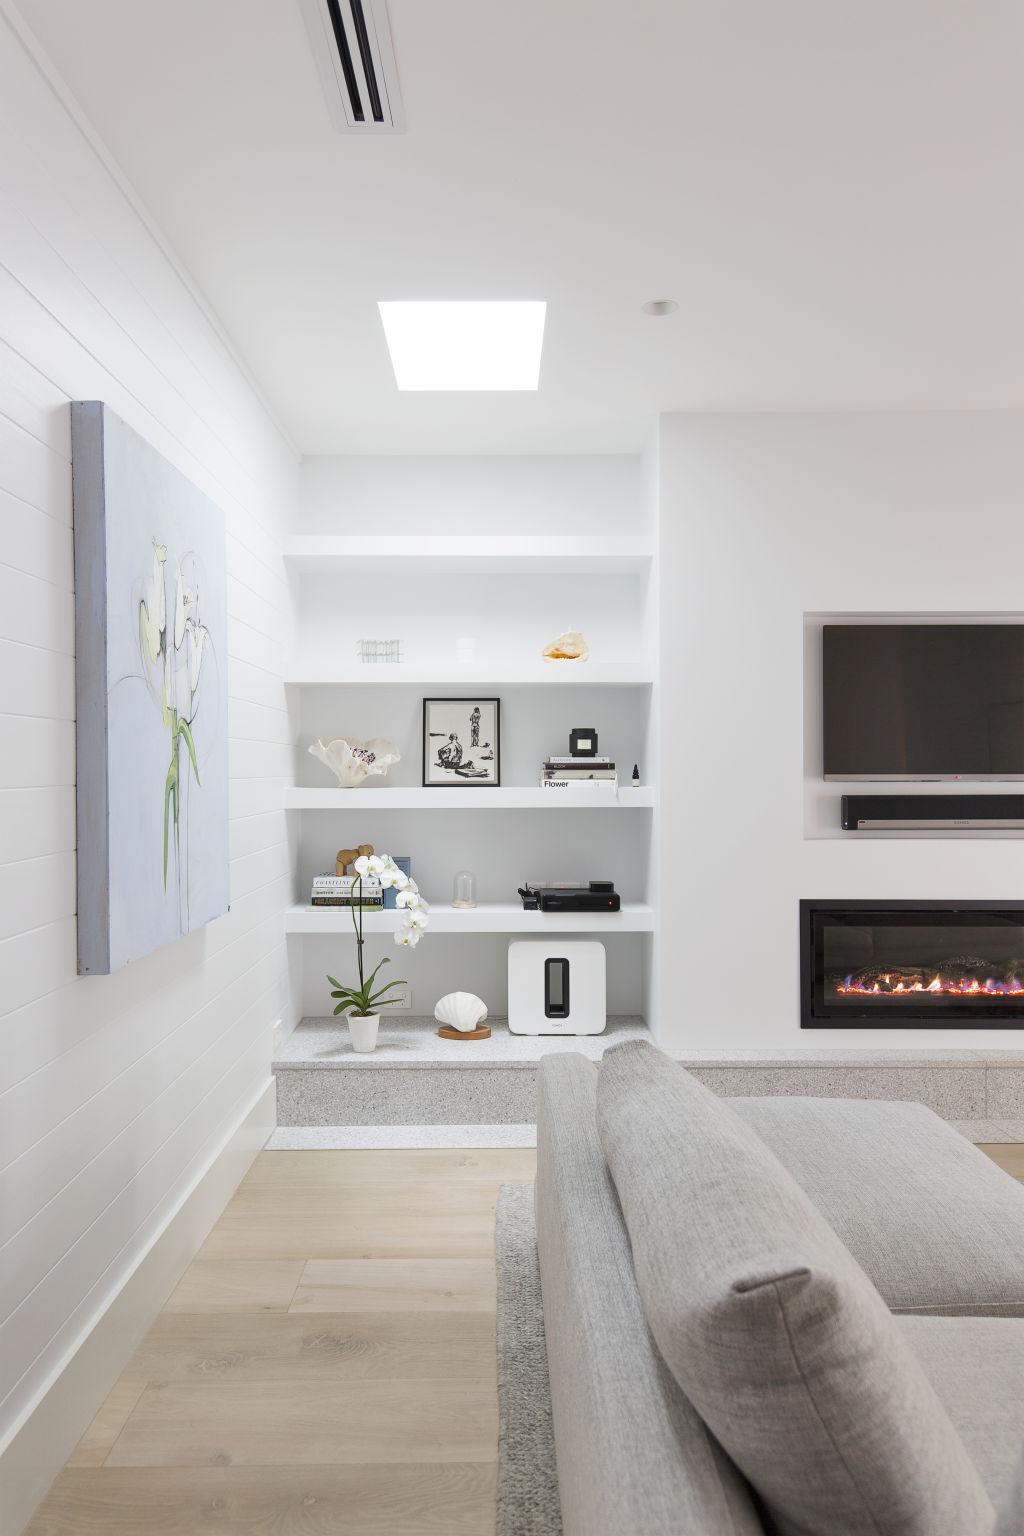 Good things take time: The 17 year renovation of Petaluma House